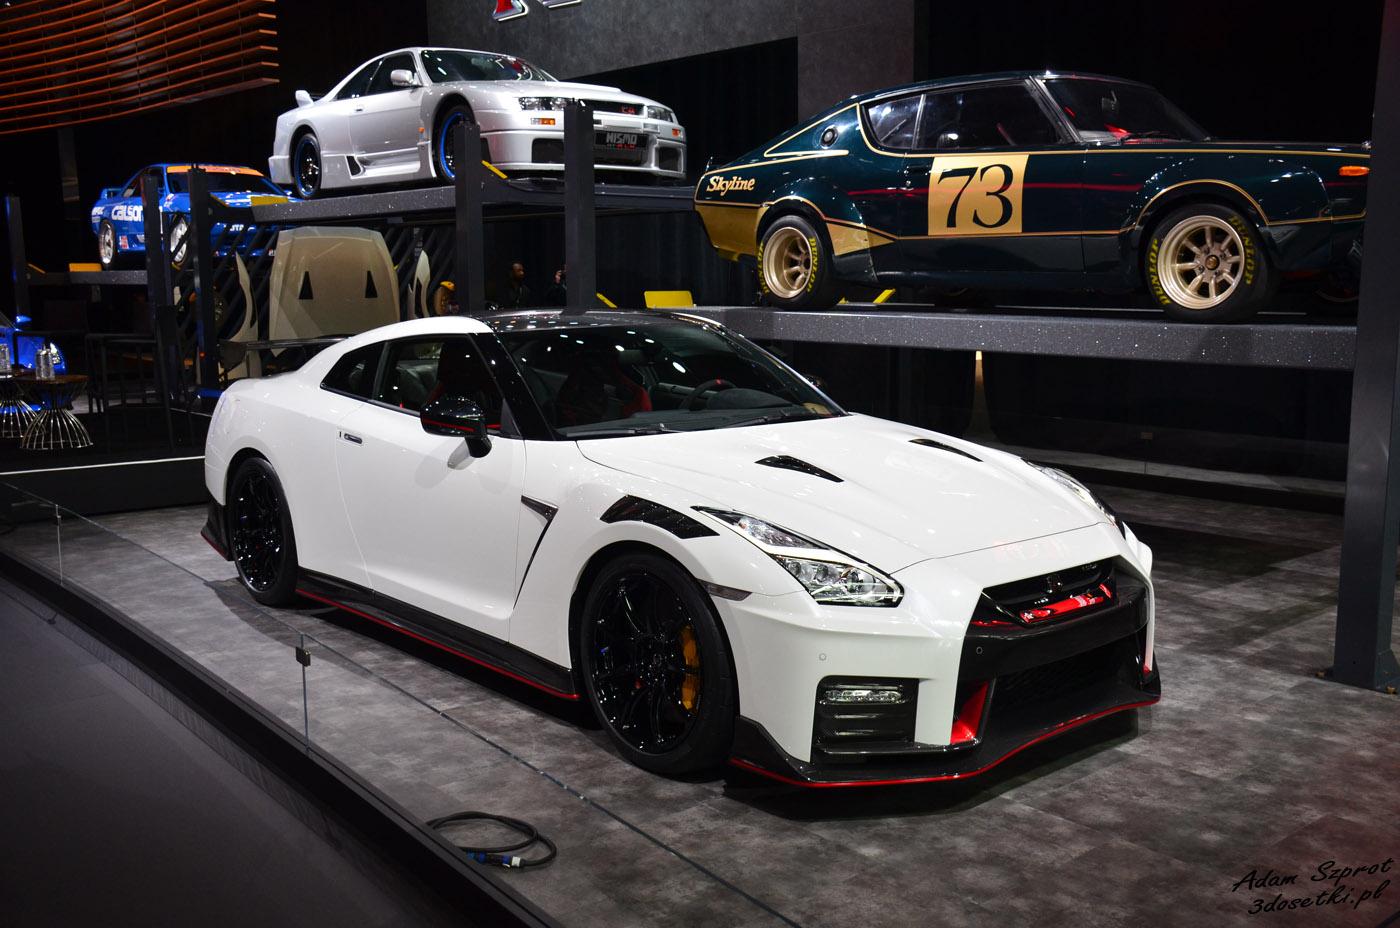 New York Auto Show 2019 - Nissan Nismo